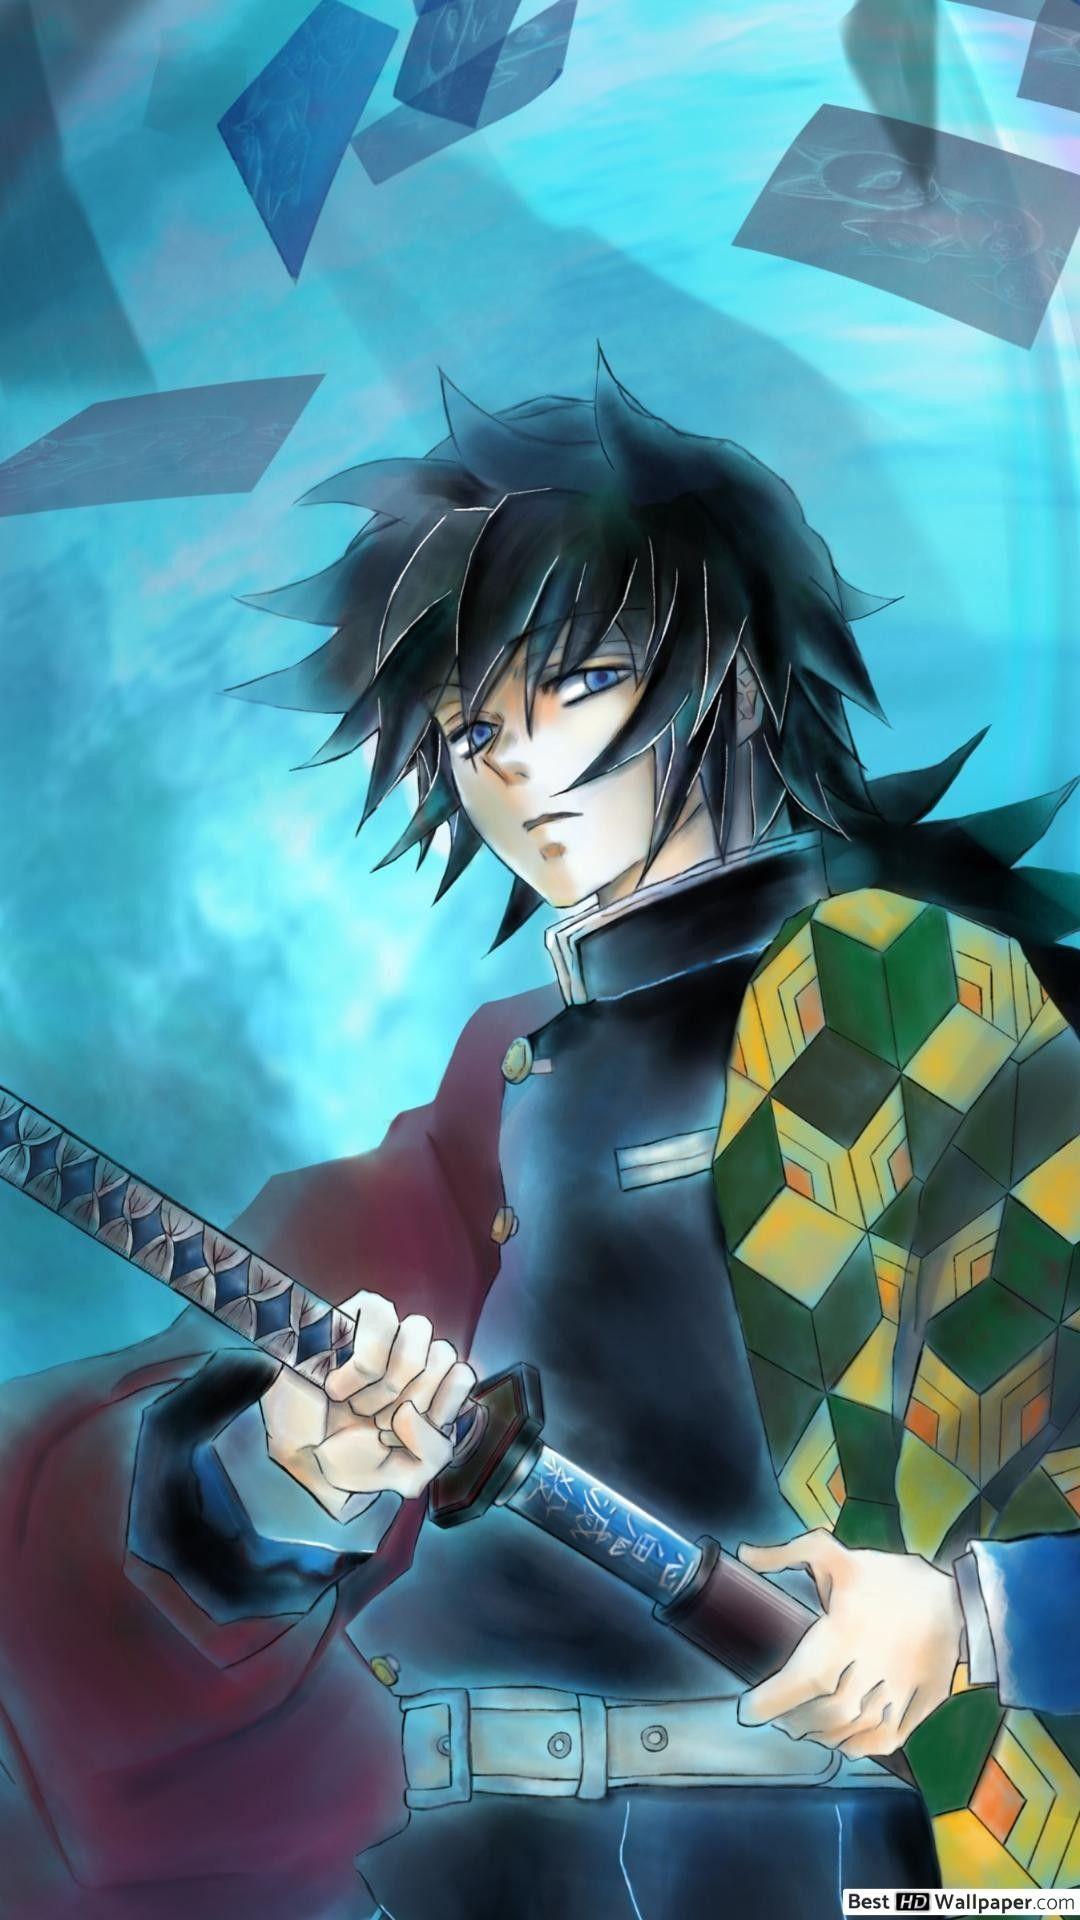 Pin by Anime Is Life on Demon Slayer Anime wallpaper, Hd